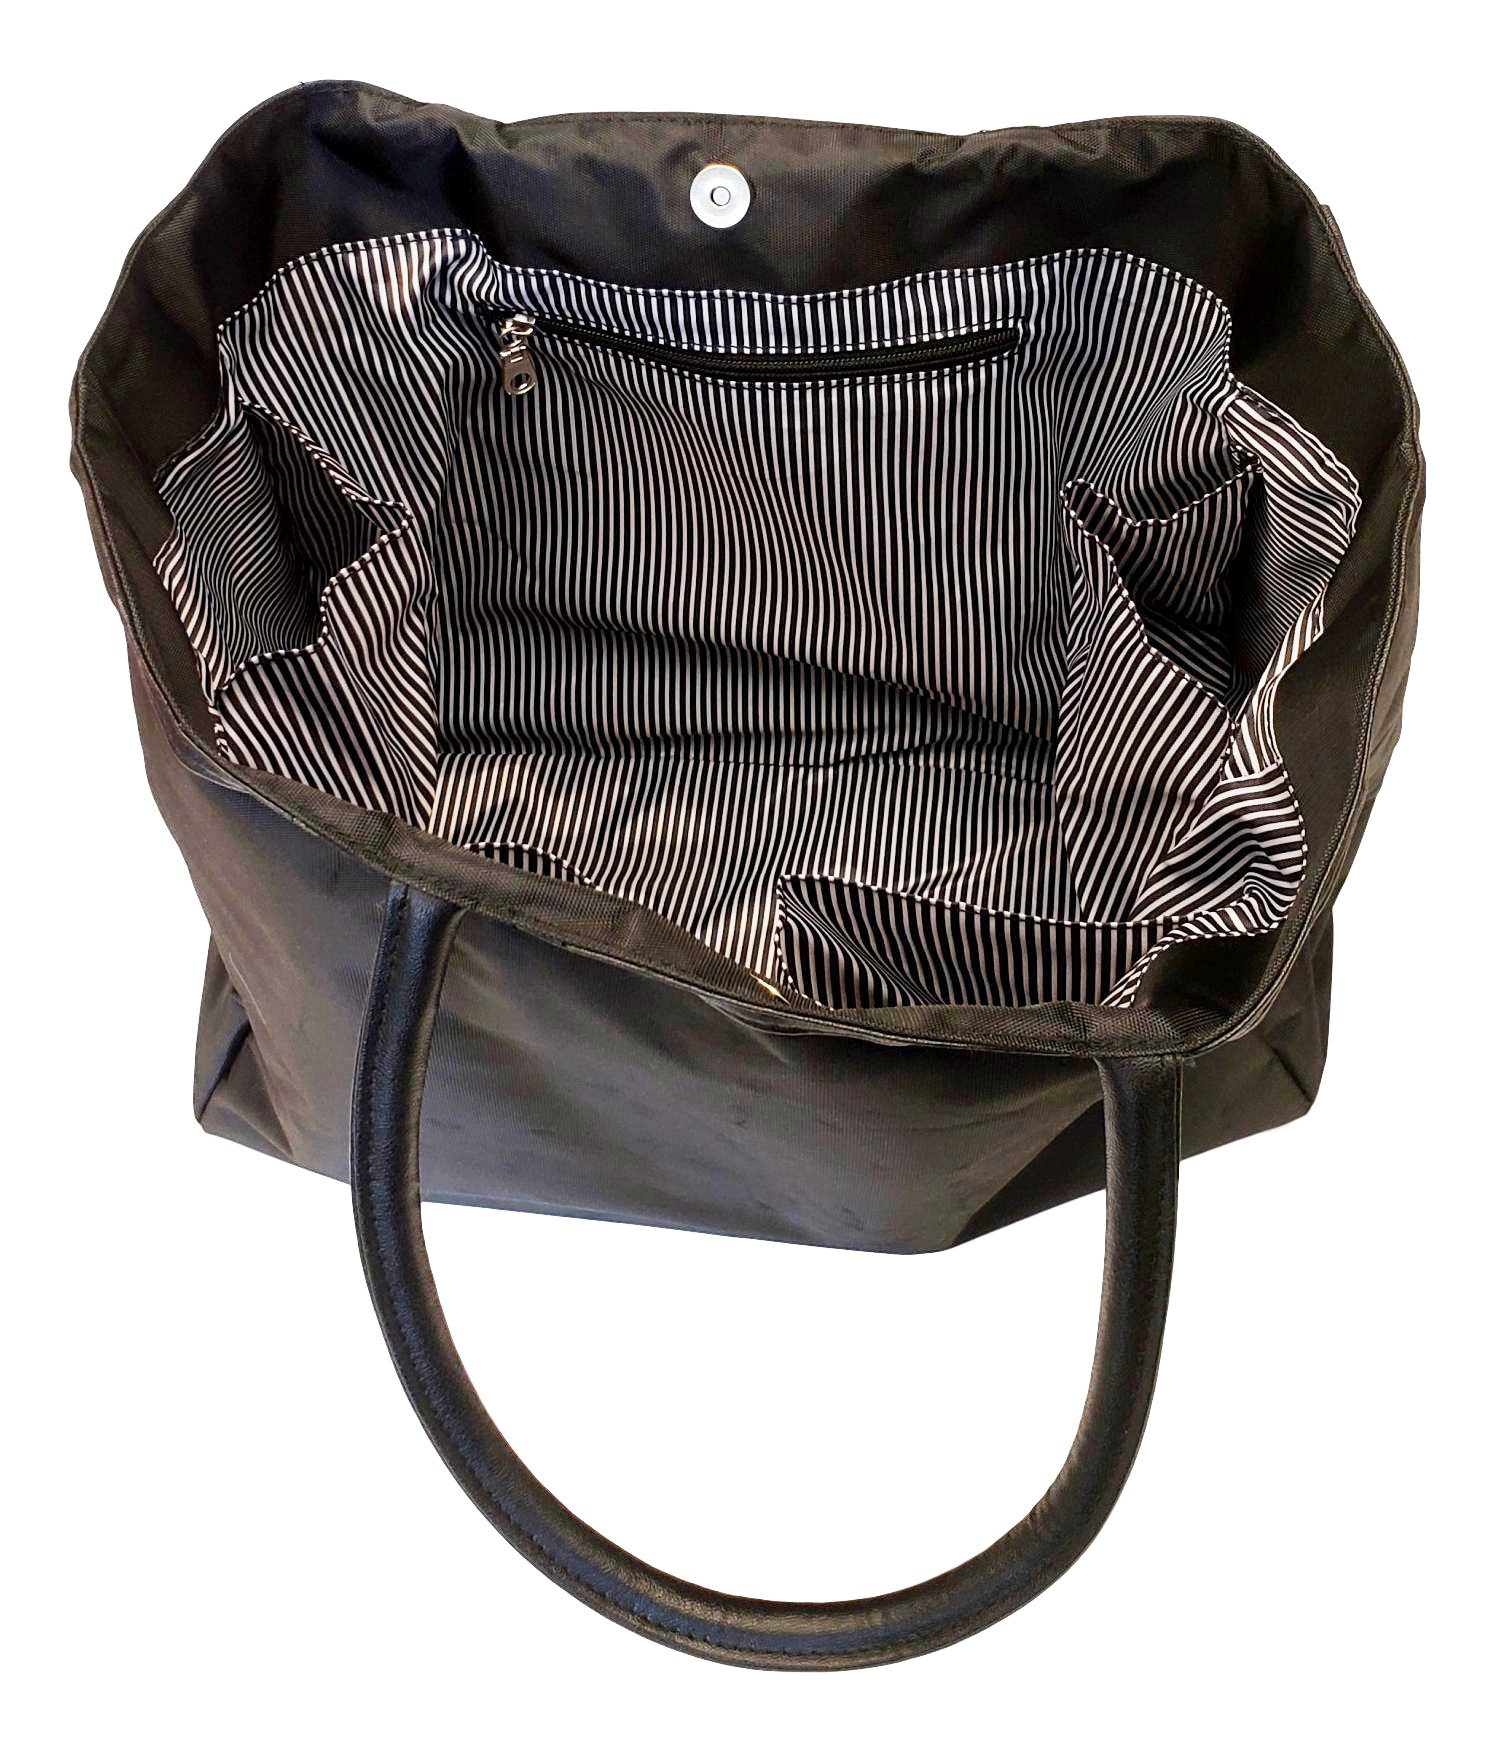 Large Black Organizing Travel Companion Purse Handbag Bag (No Embroidery - Black) by Sona G Designs (Image #5)